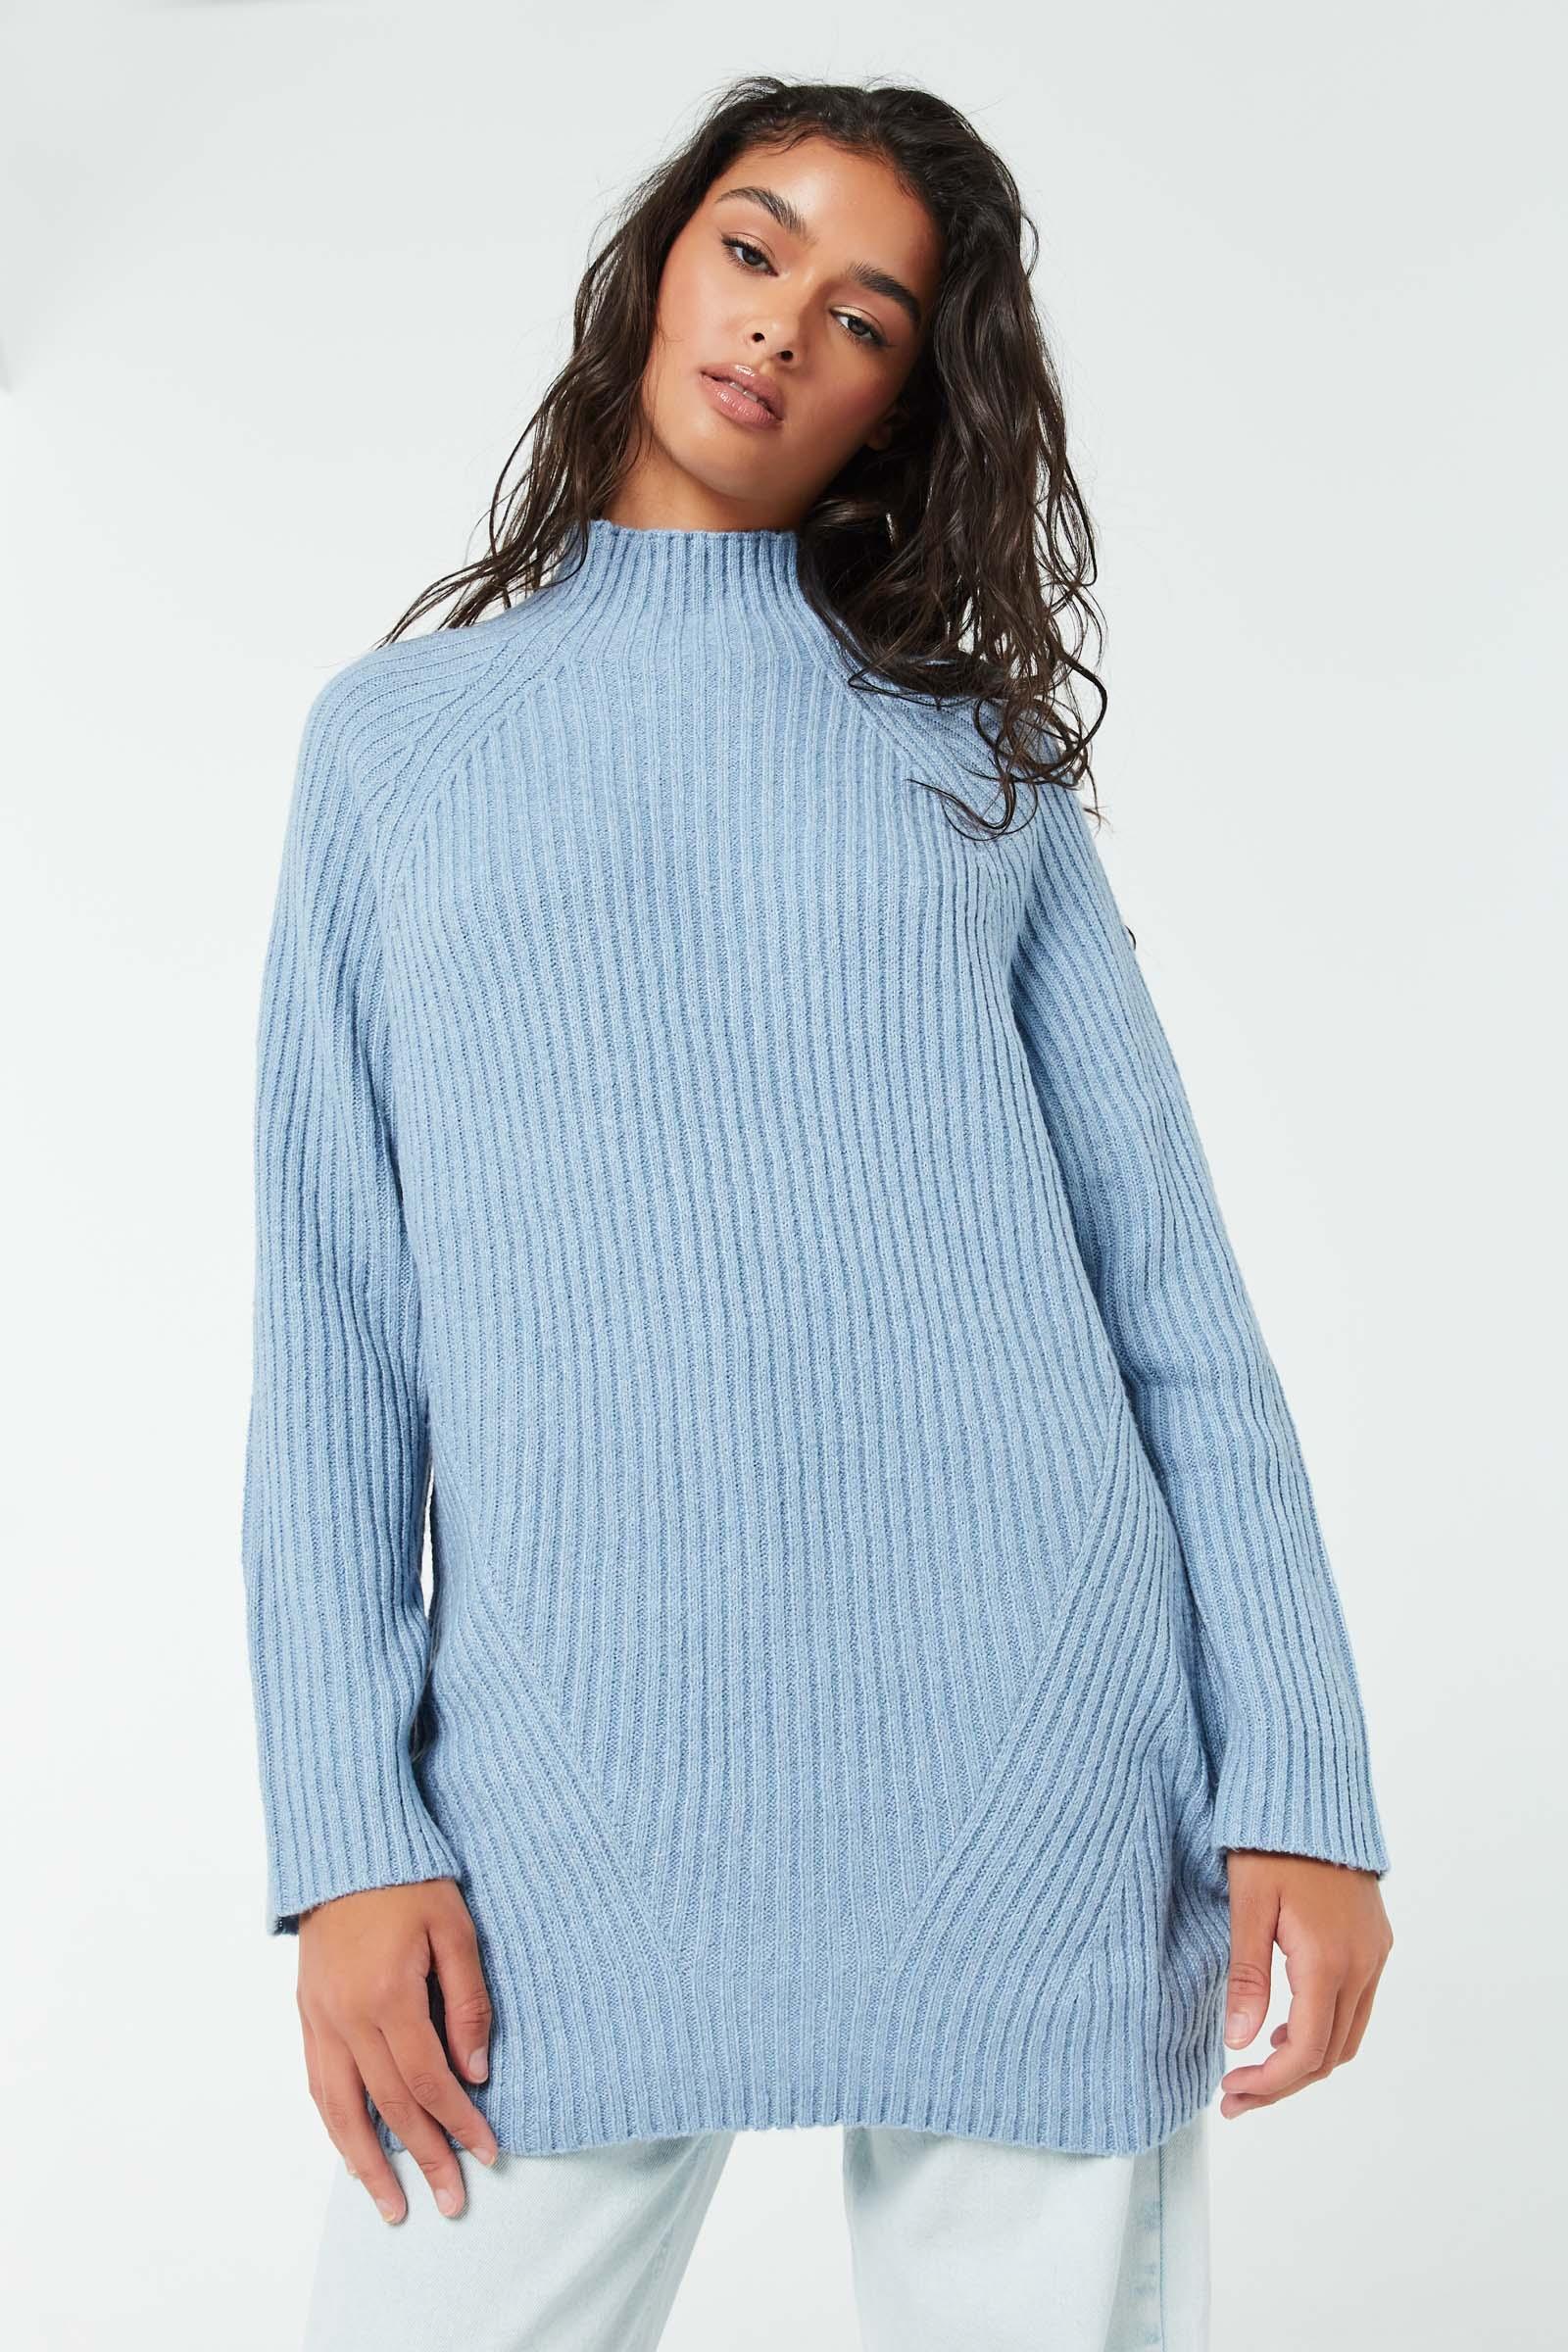 Tunic Raglan Sweater with Mock Neck